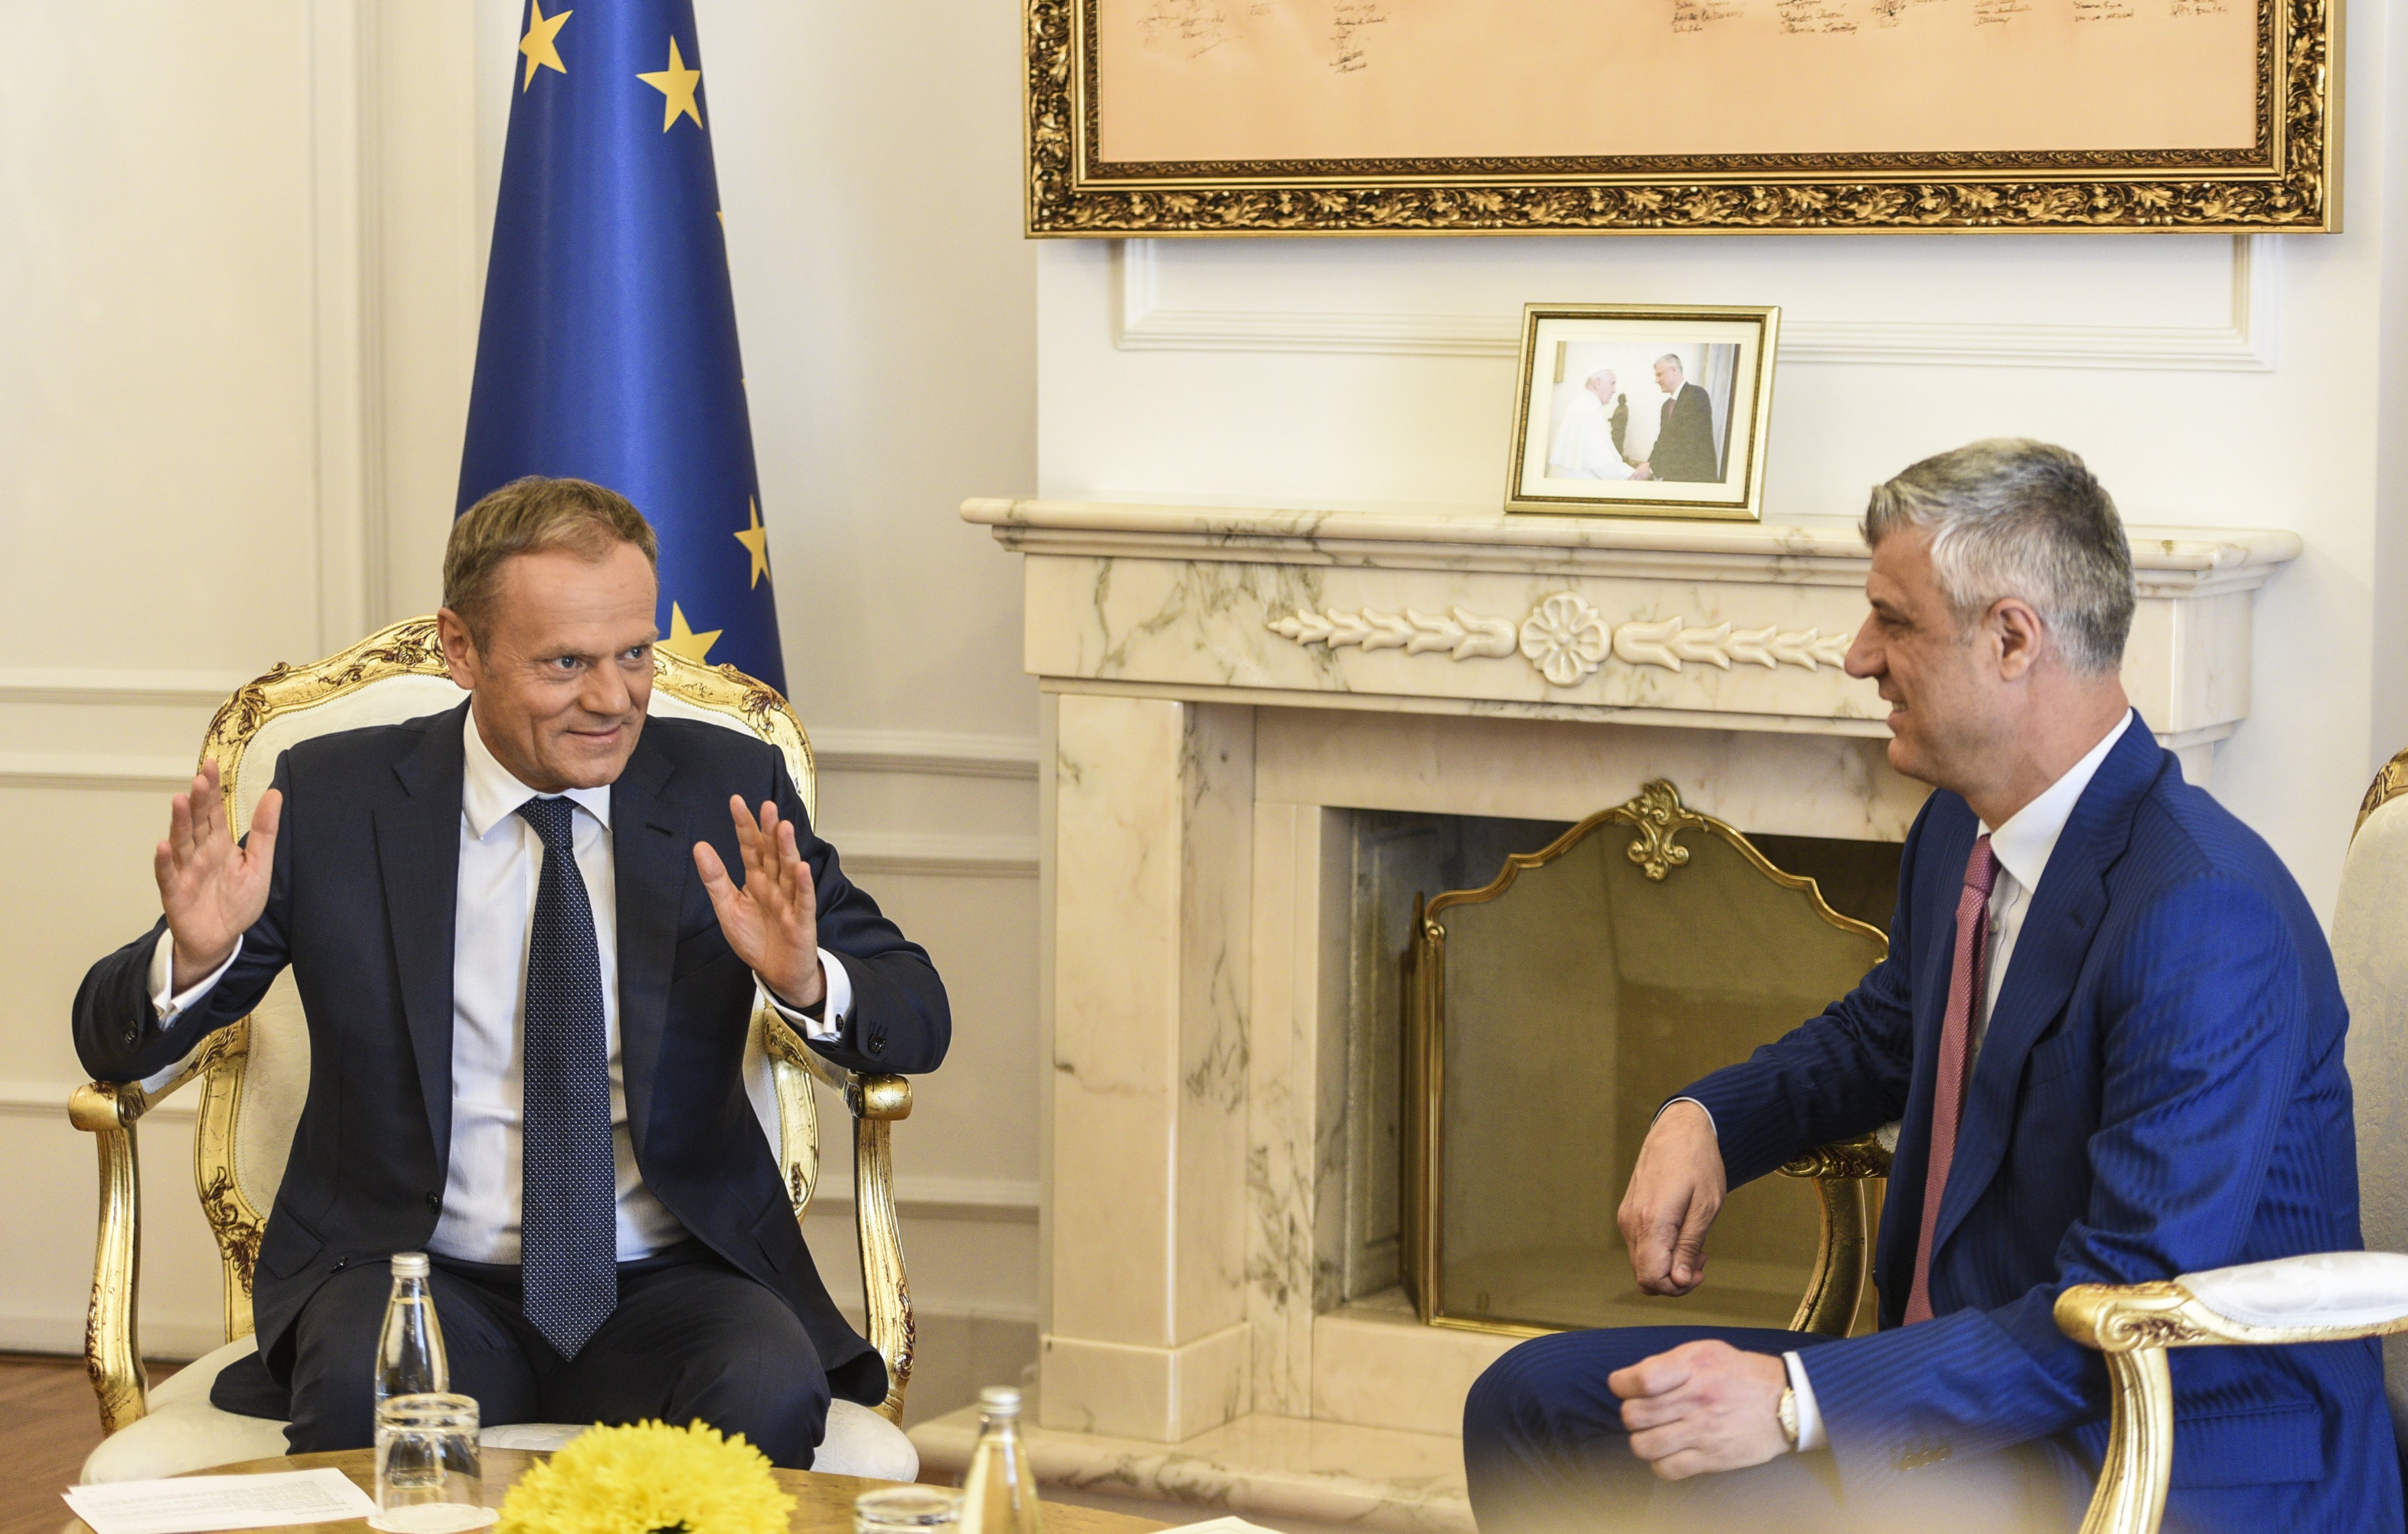 Tusk Kosovo pozvao da popravi odnose sa Srbijom